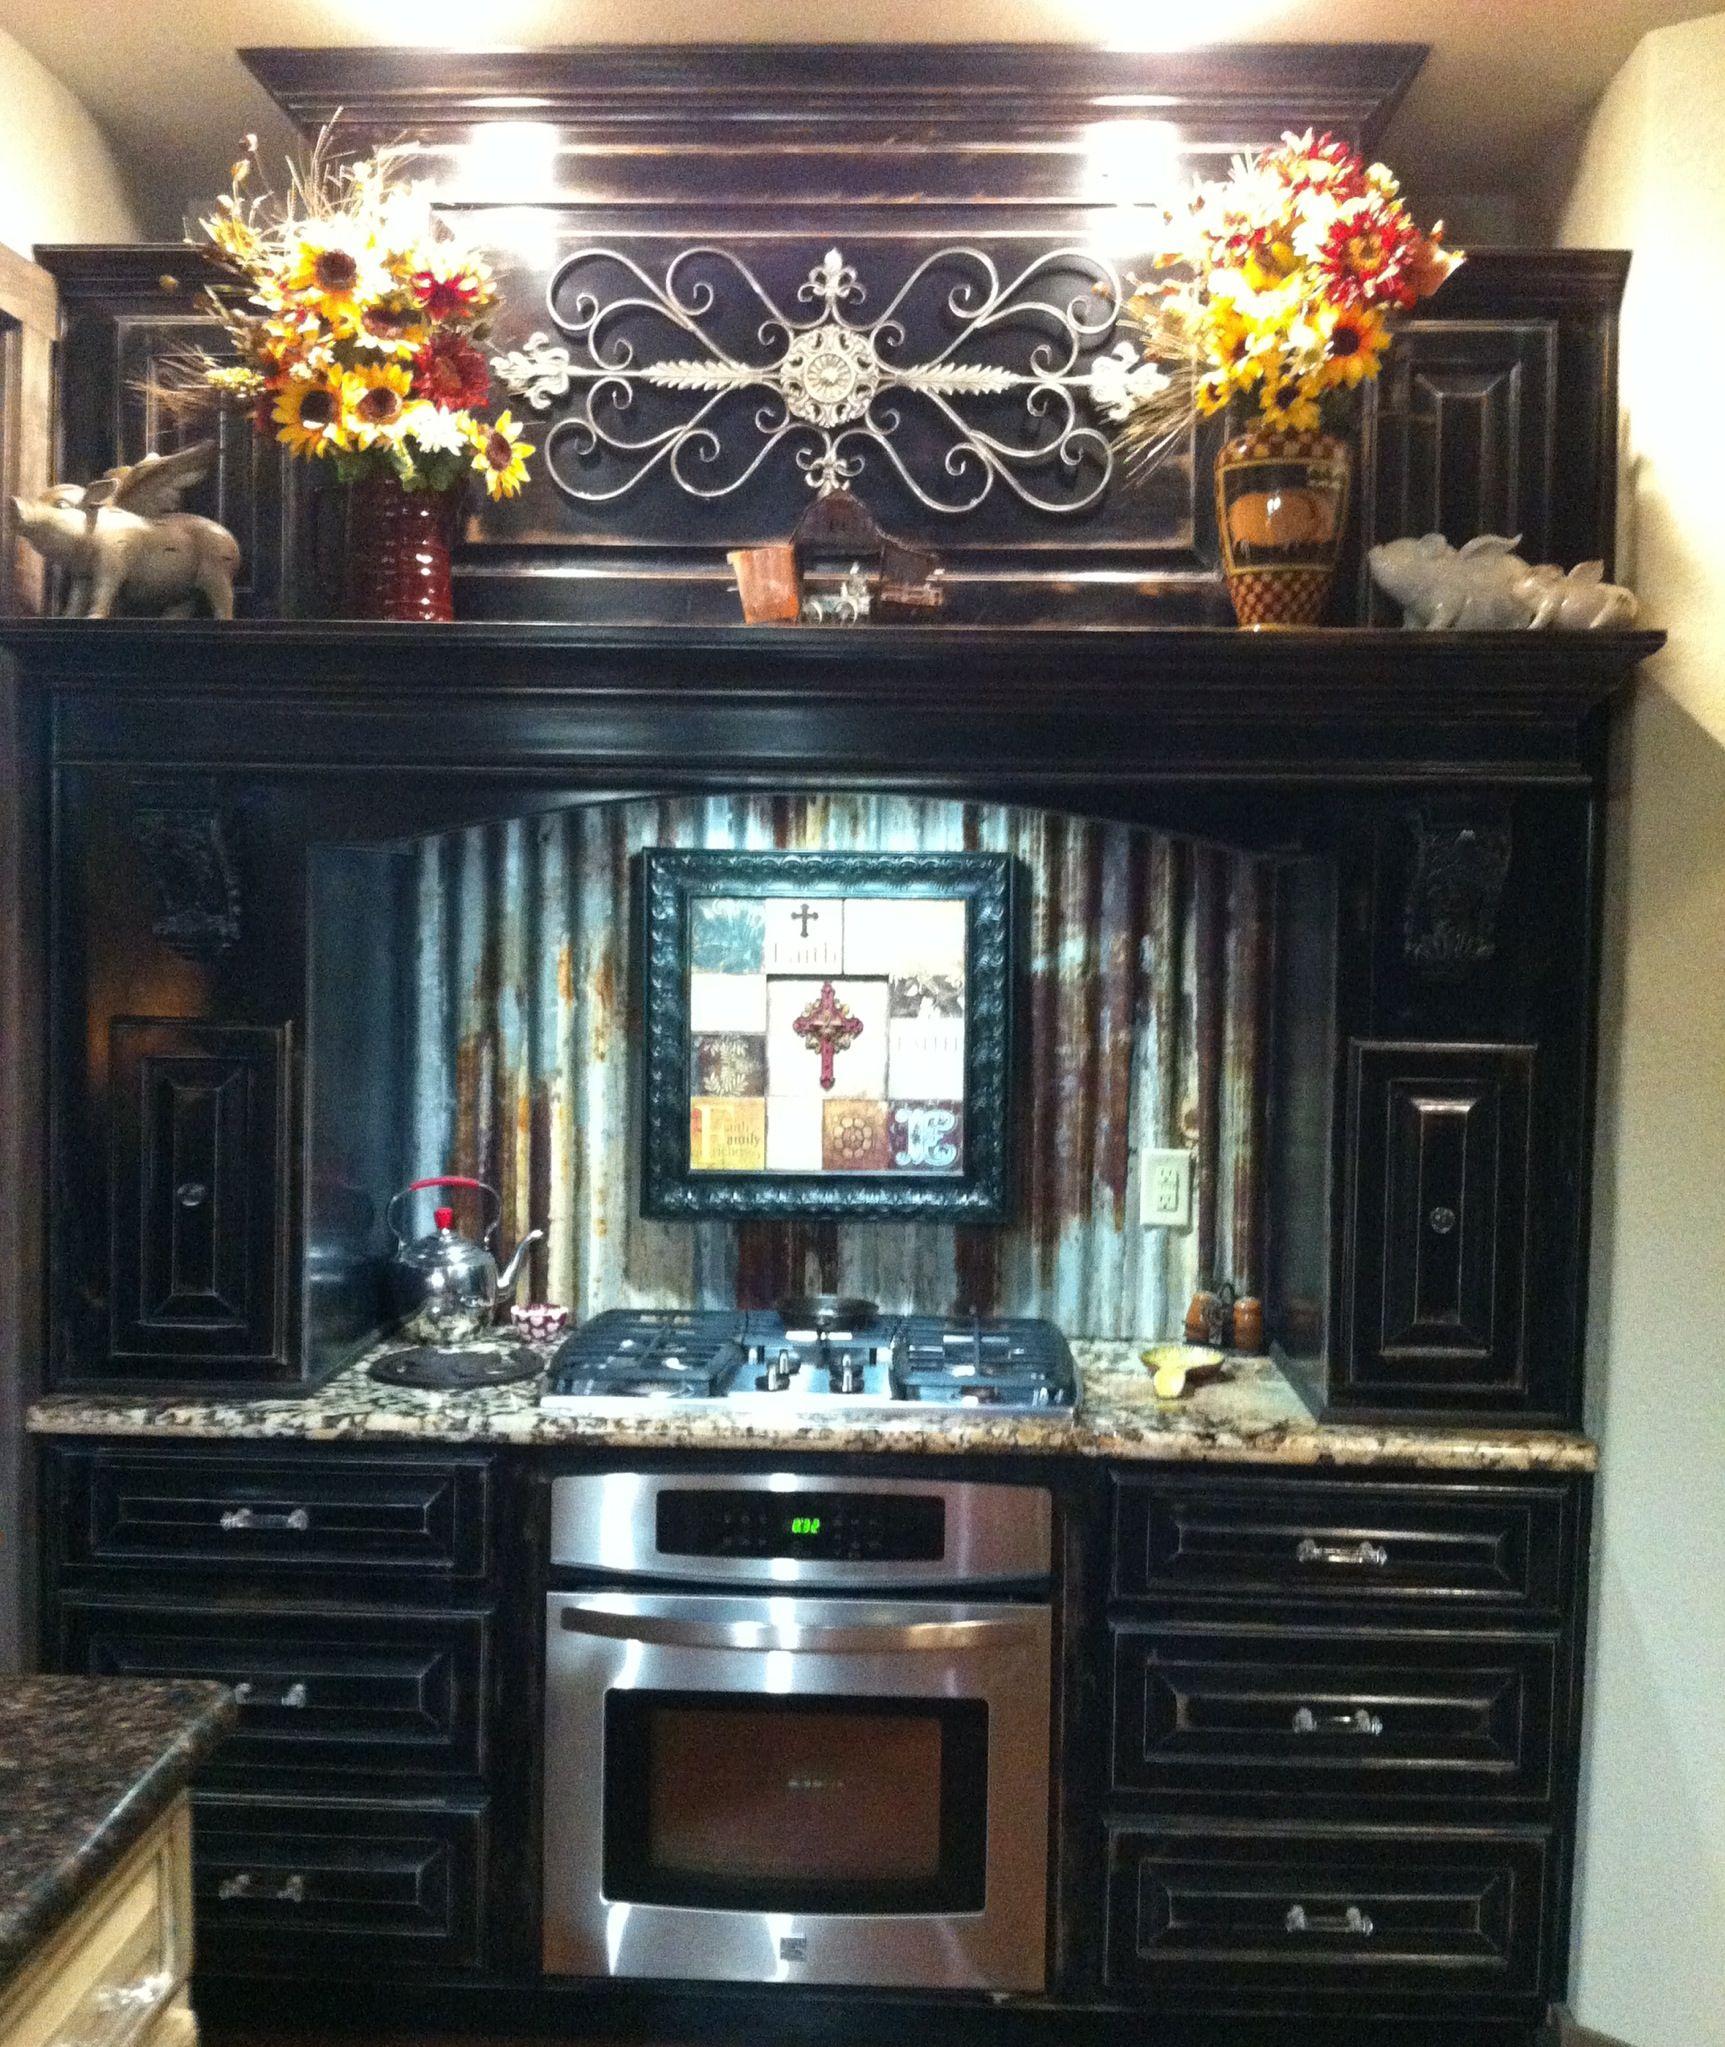 Kitchen Cabinets Distressed: Black Antiqued/distressed Kitchen Cabinets, Old Barn Tin